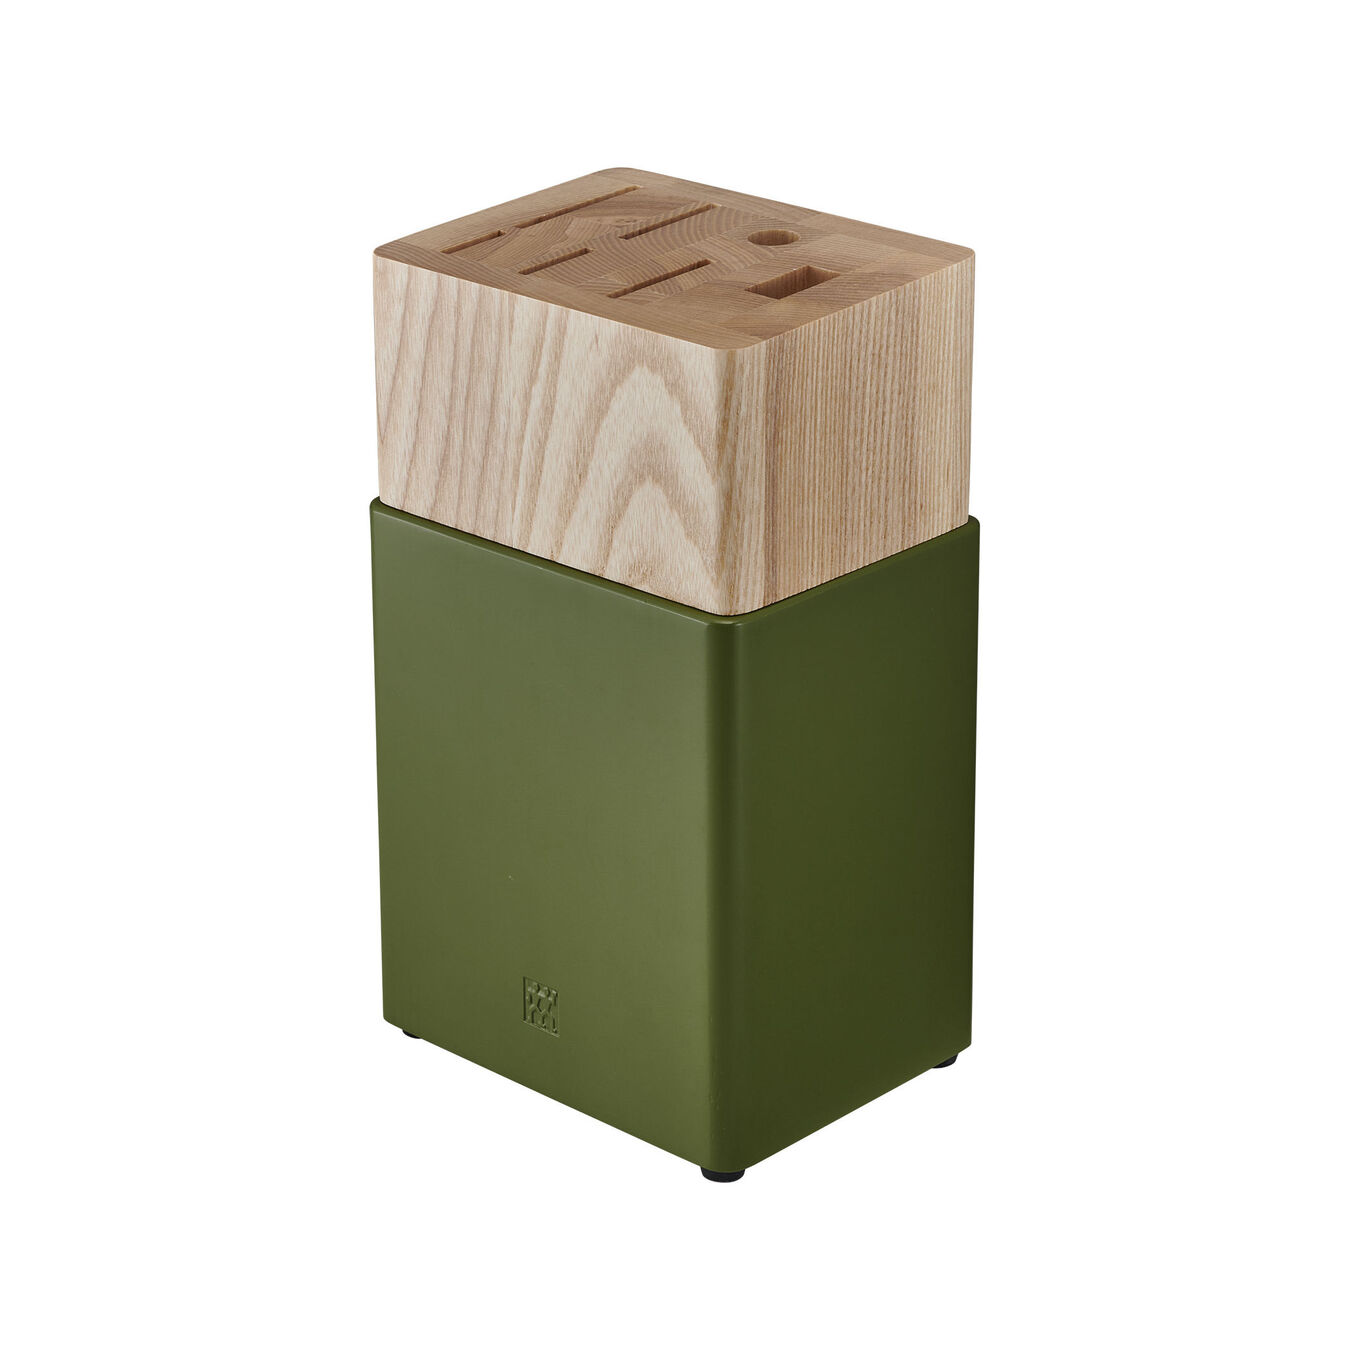 6-pc Knife Block Set - Lime Green,,large 3